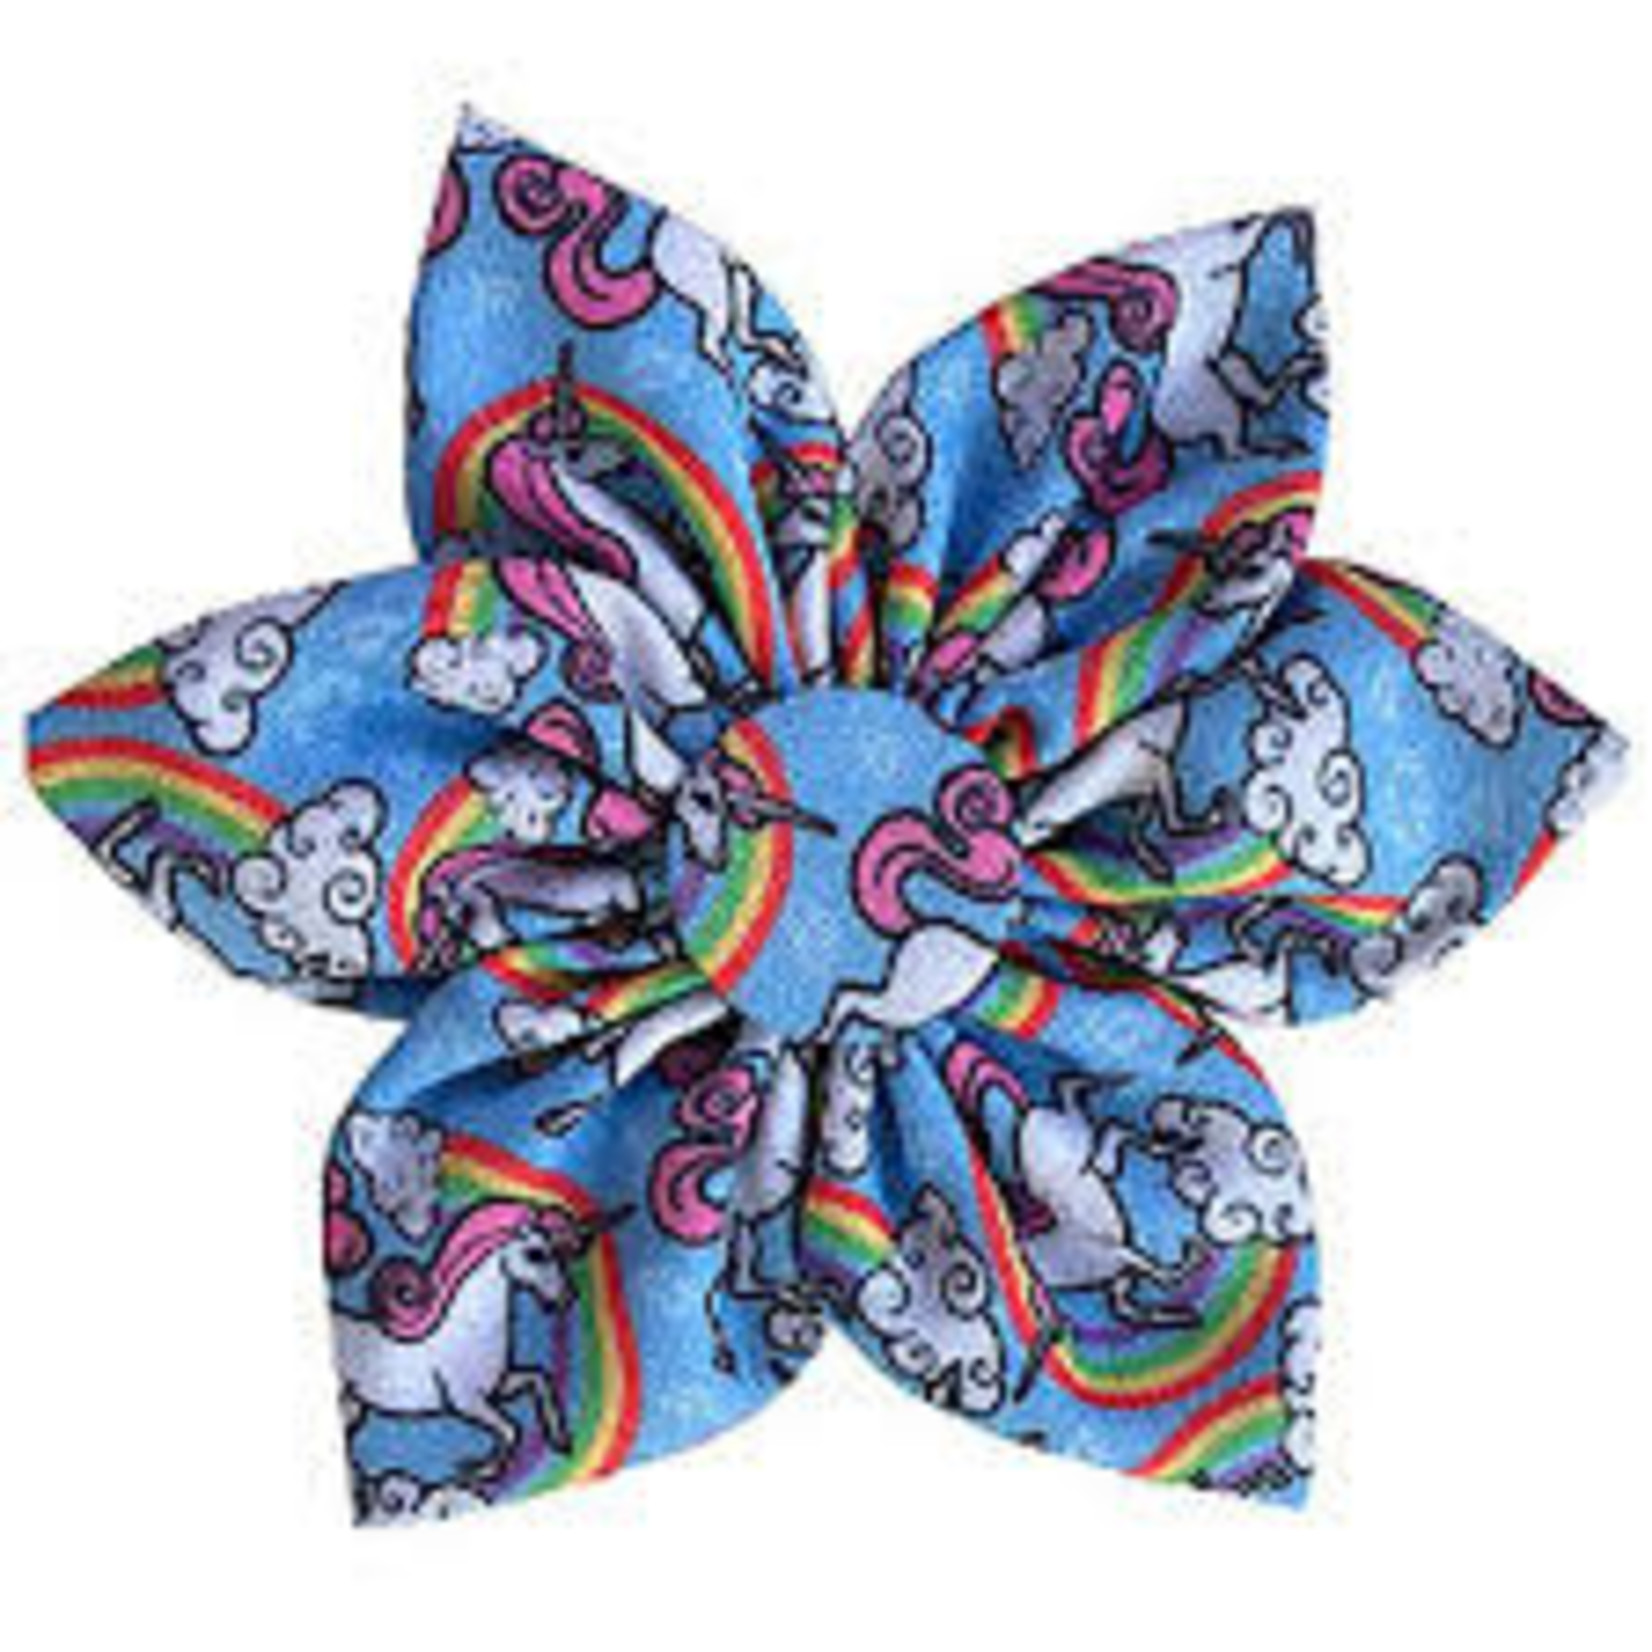 Huxley & Kent Huxley & Kent Pinwheel Magic Unicorn Large